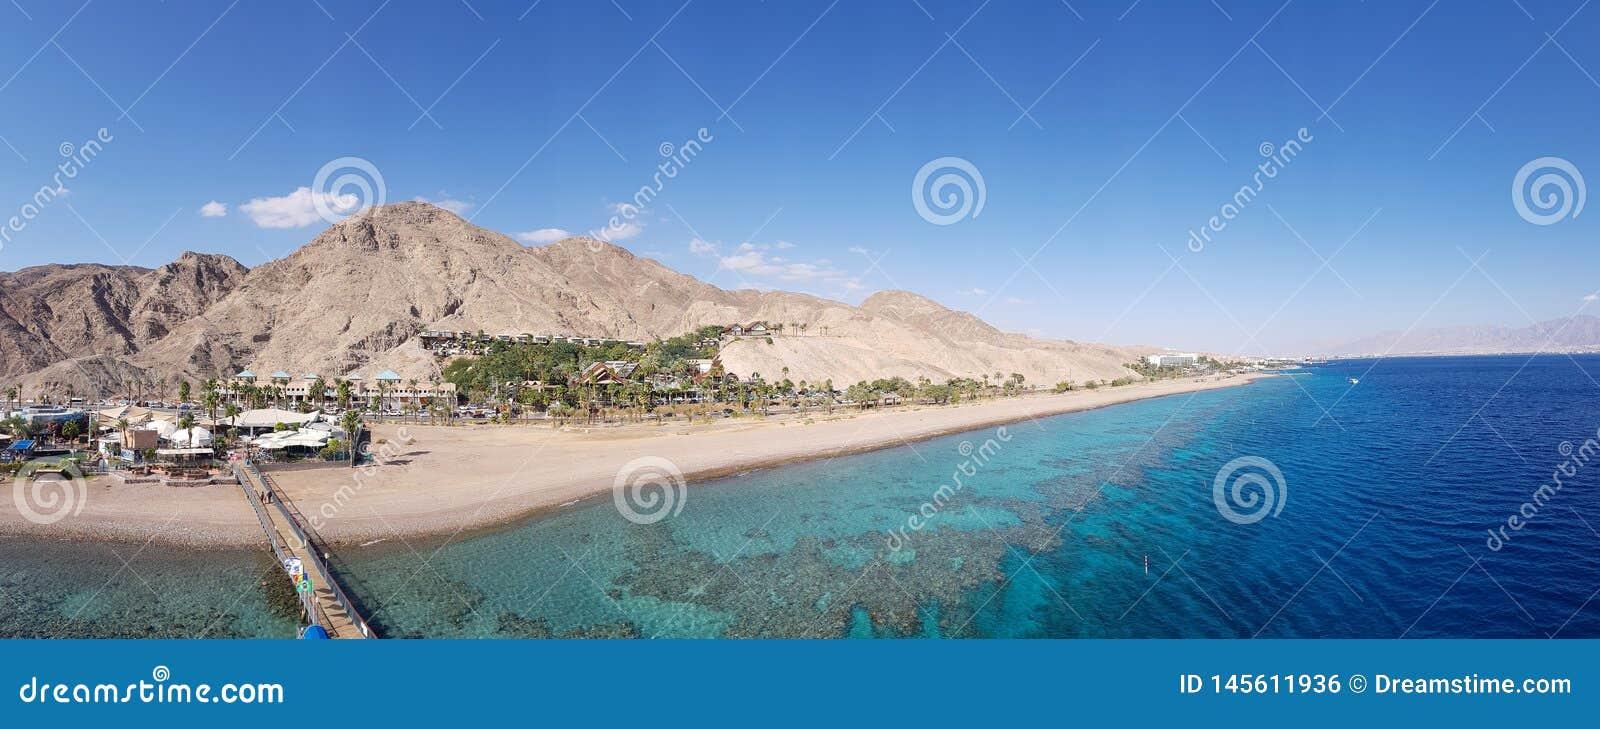 Widok nadmorski Eilat